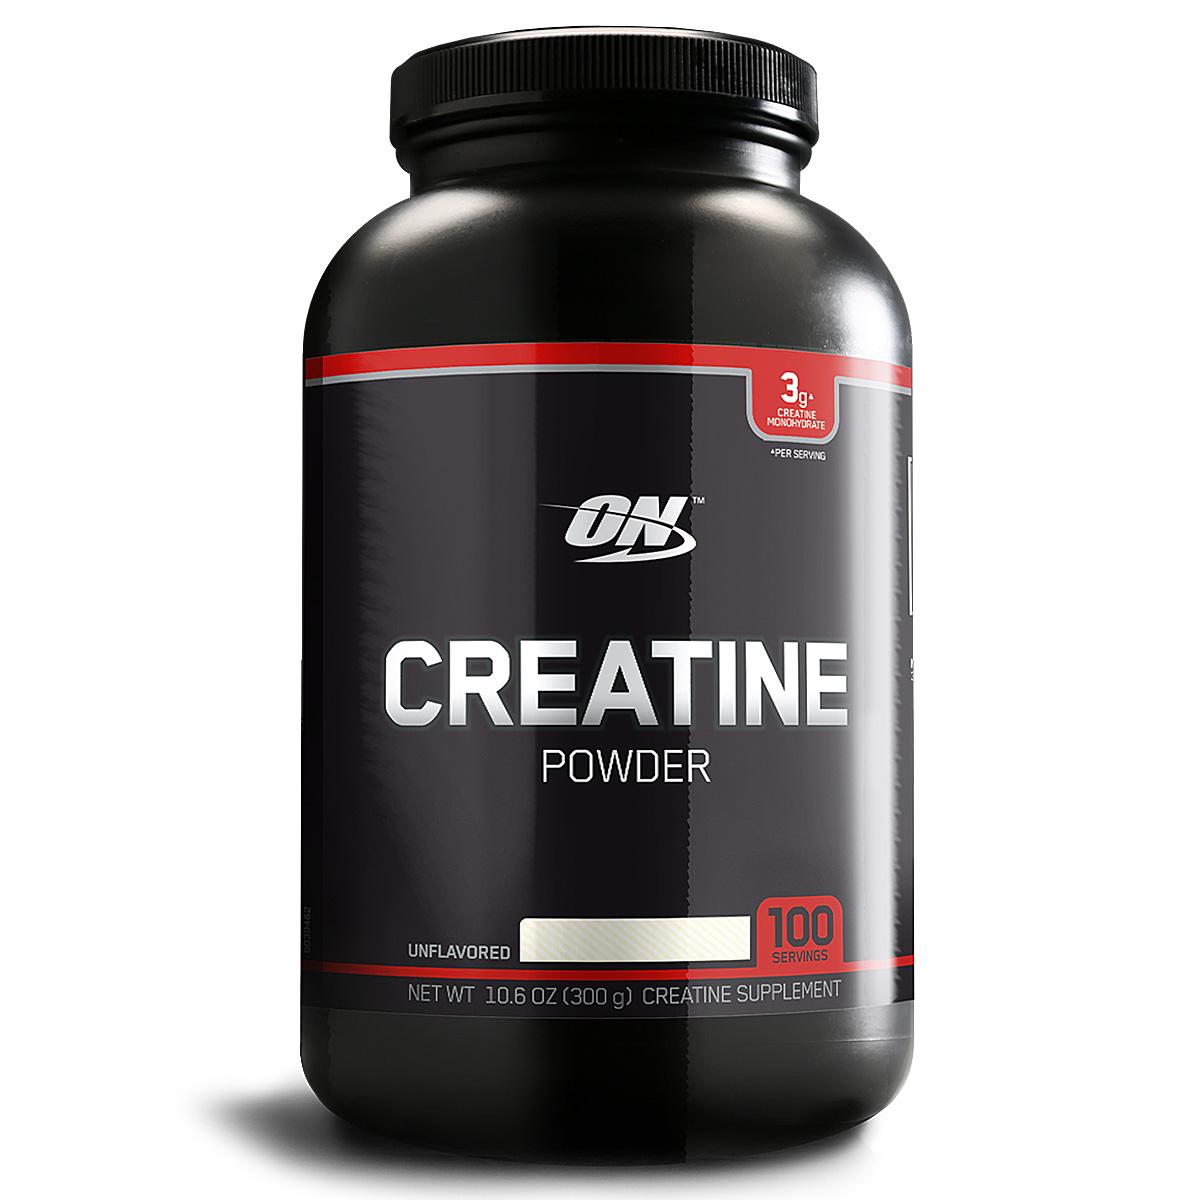 Creatine Powder Black 200g Optimum Nutrition